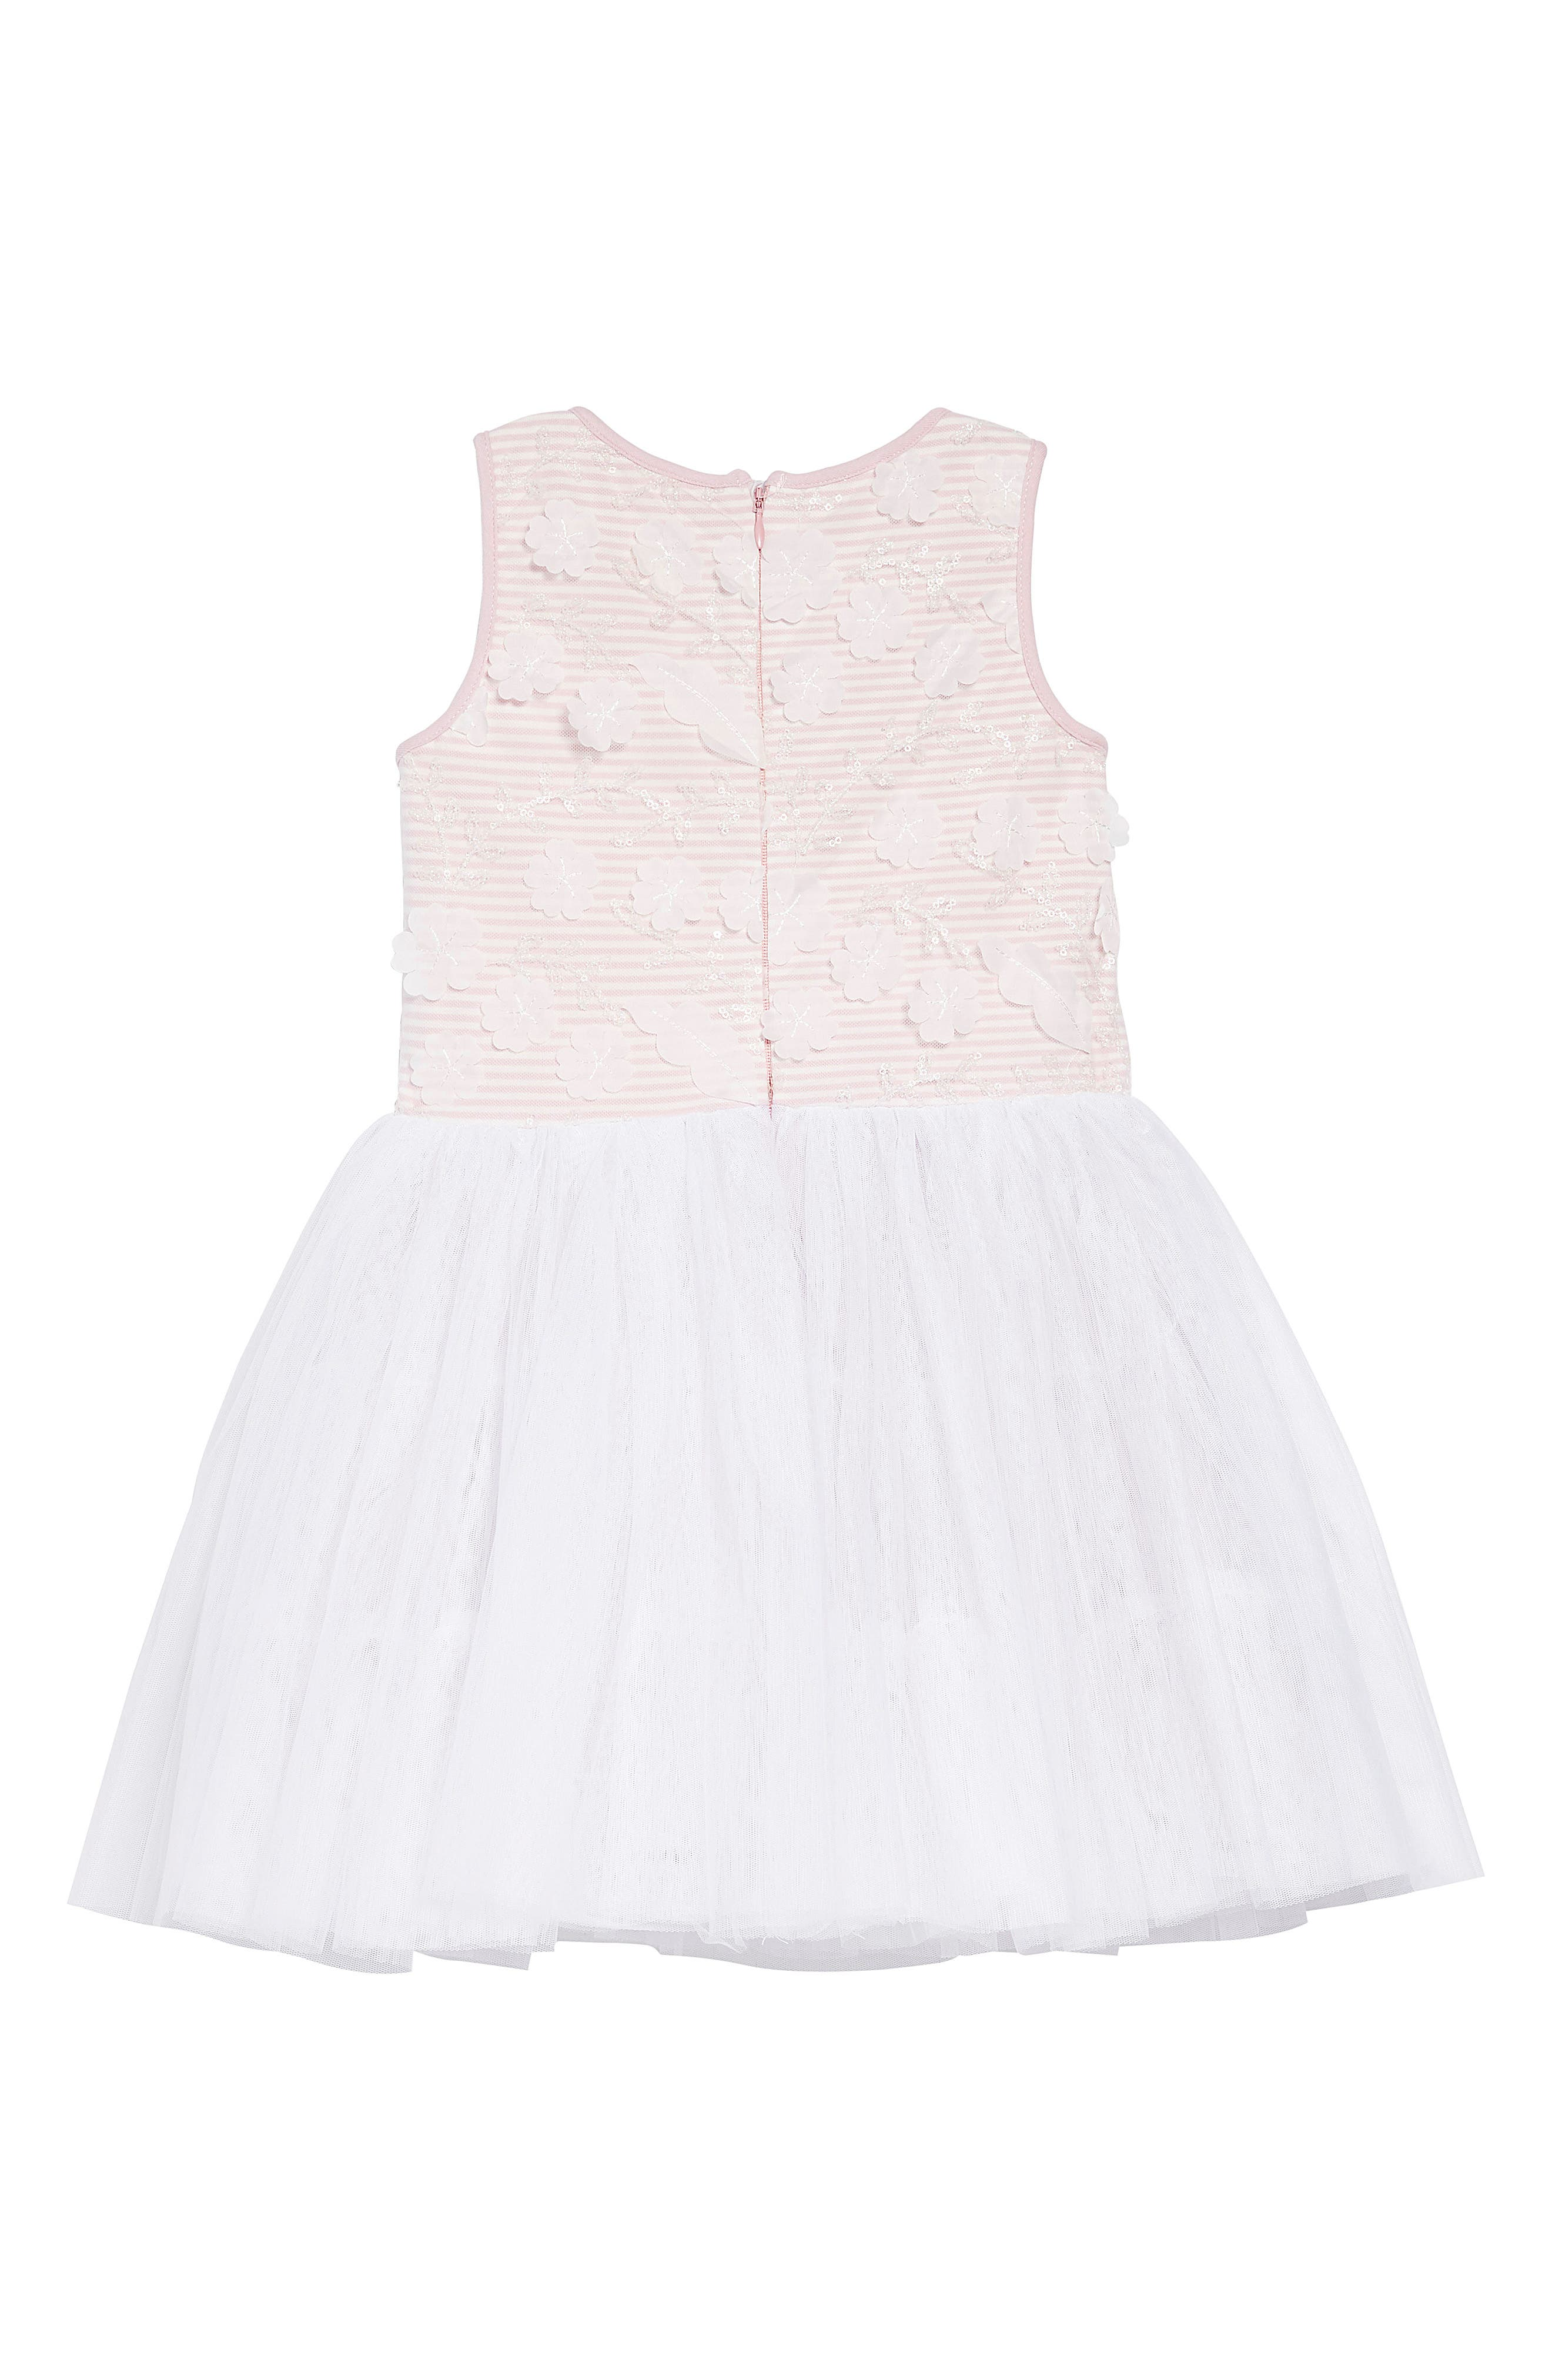 Embellished Bodice Dress,                             Alternate thumbnail 2, color,                             PINK/ WHITE